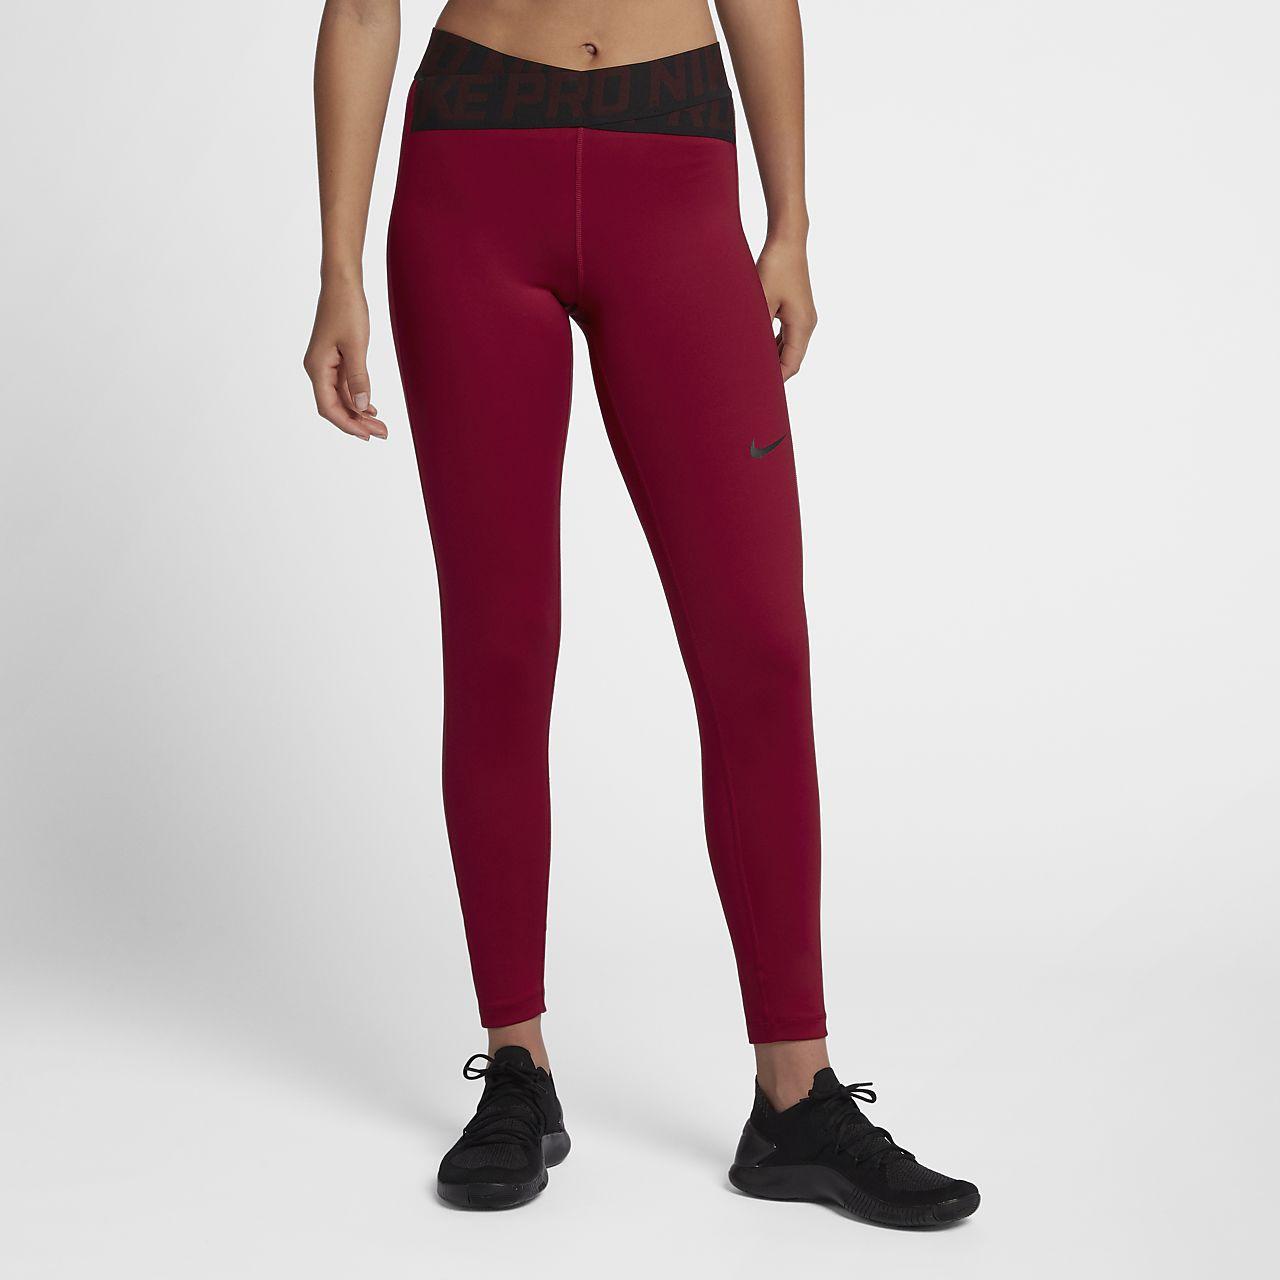 Nike Pro Intertwist Women s High-Rise Training Tights. Nike.com cb0033aa2